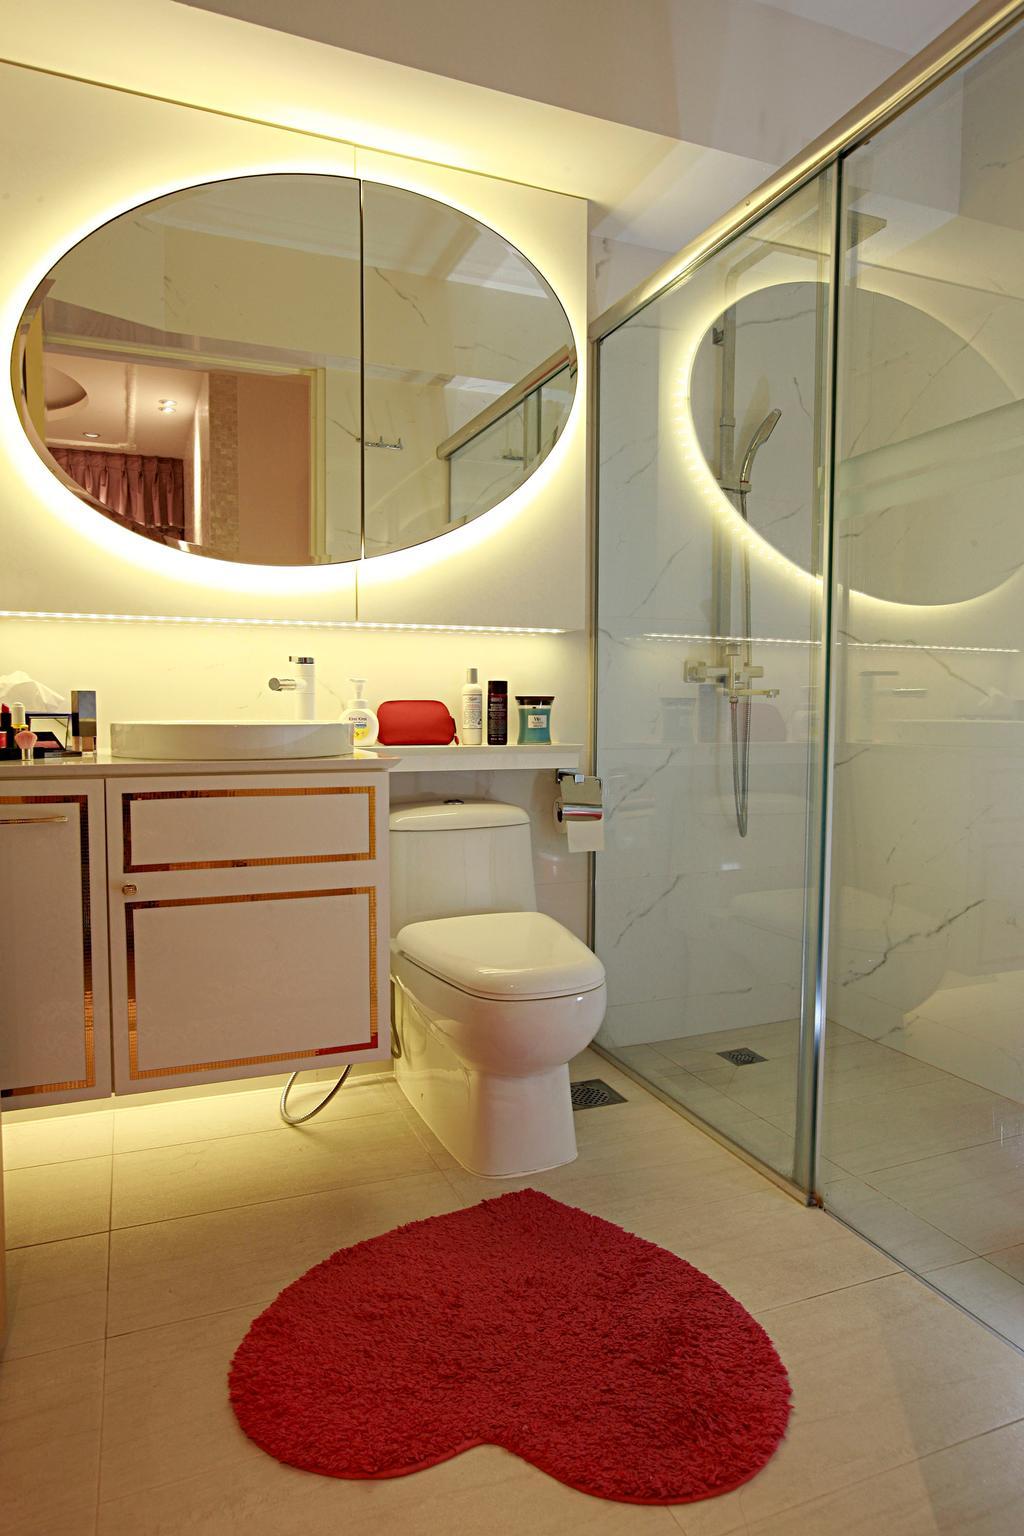 Vintage, HDB, Bathroom, Tampines Central 8, Interior Designer, Urban Habitat Design, Heart Shaped Carpet, Red Carpet, Cute Carpet, Round Mirror, Bathroom Vanity, Bathroom Sink, Vessel Sink, Concealed Lighting, Toilet Bowl, Water Closet, Toilet